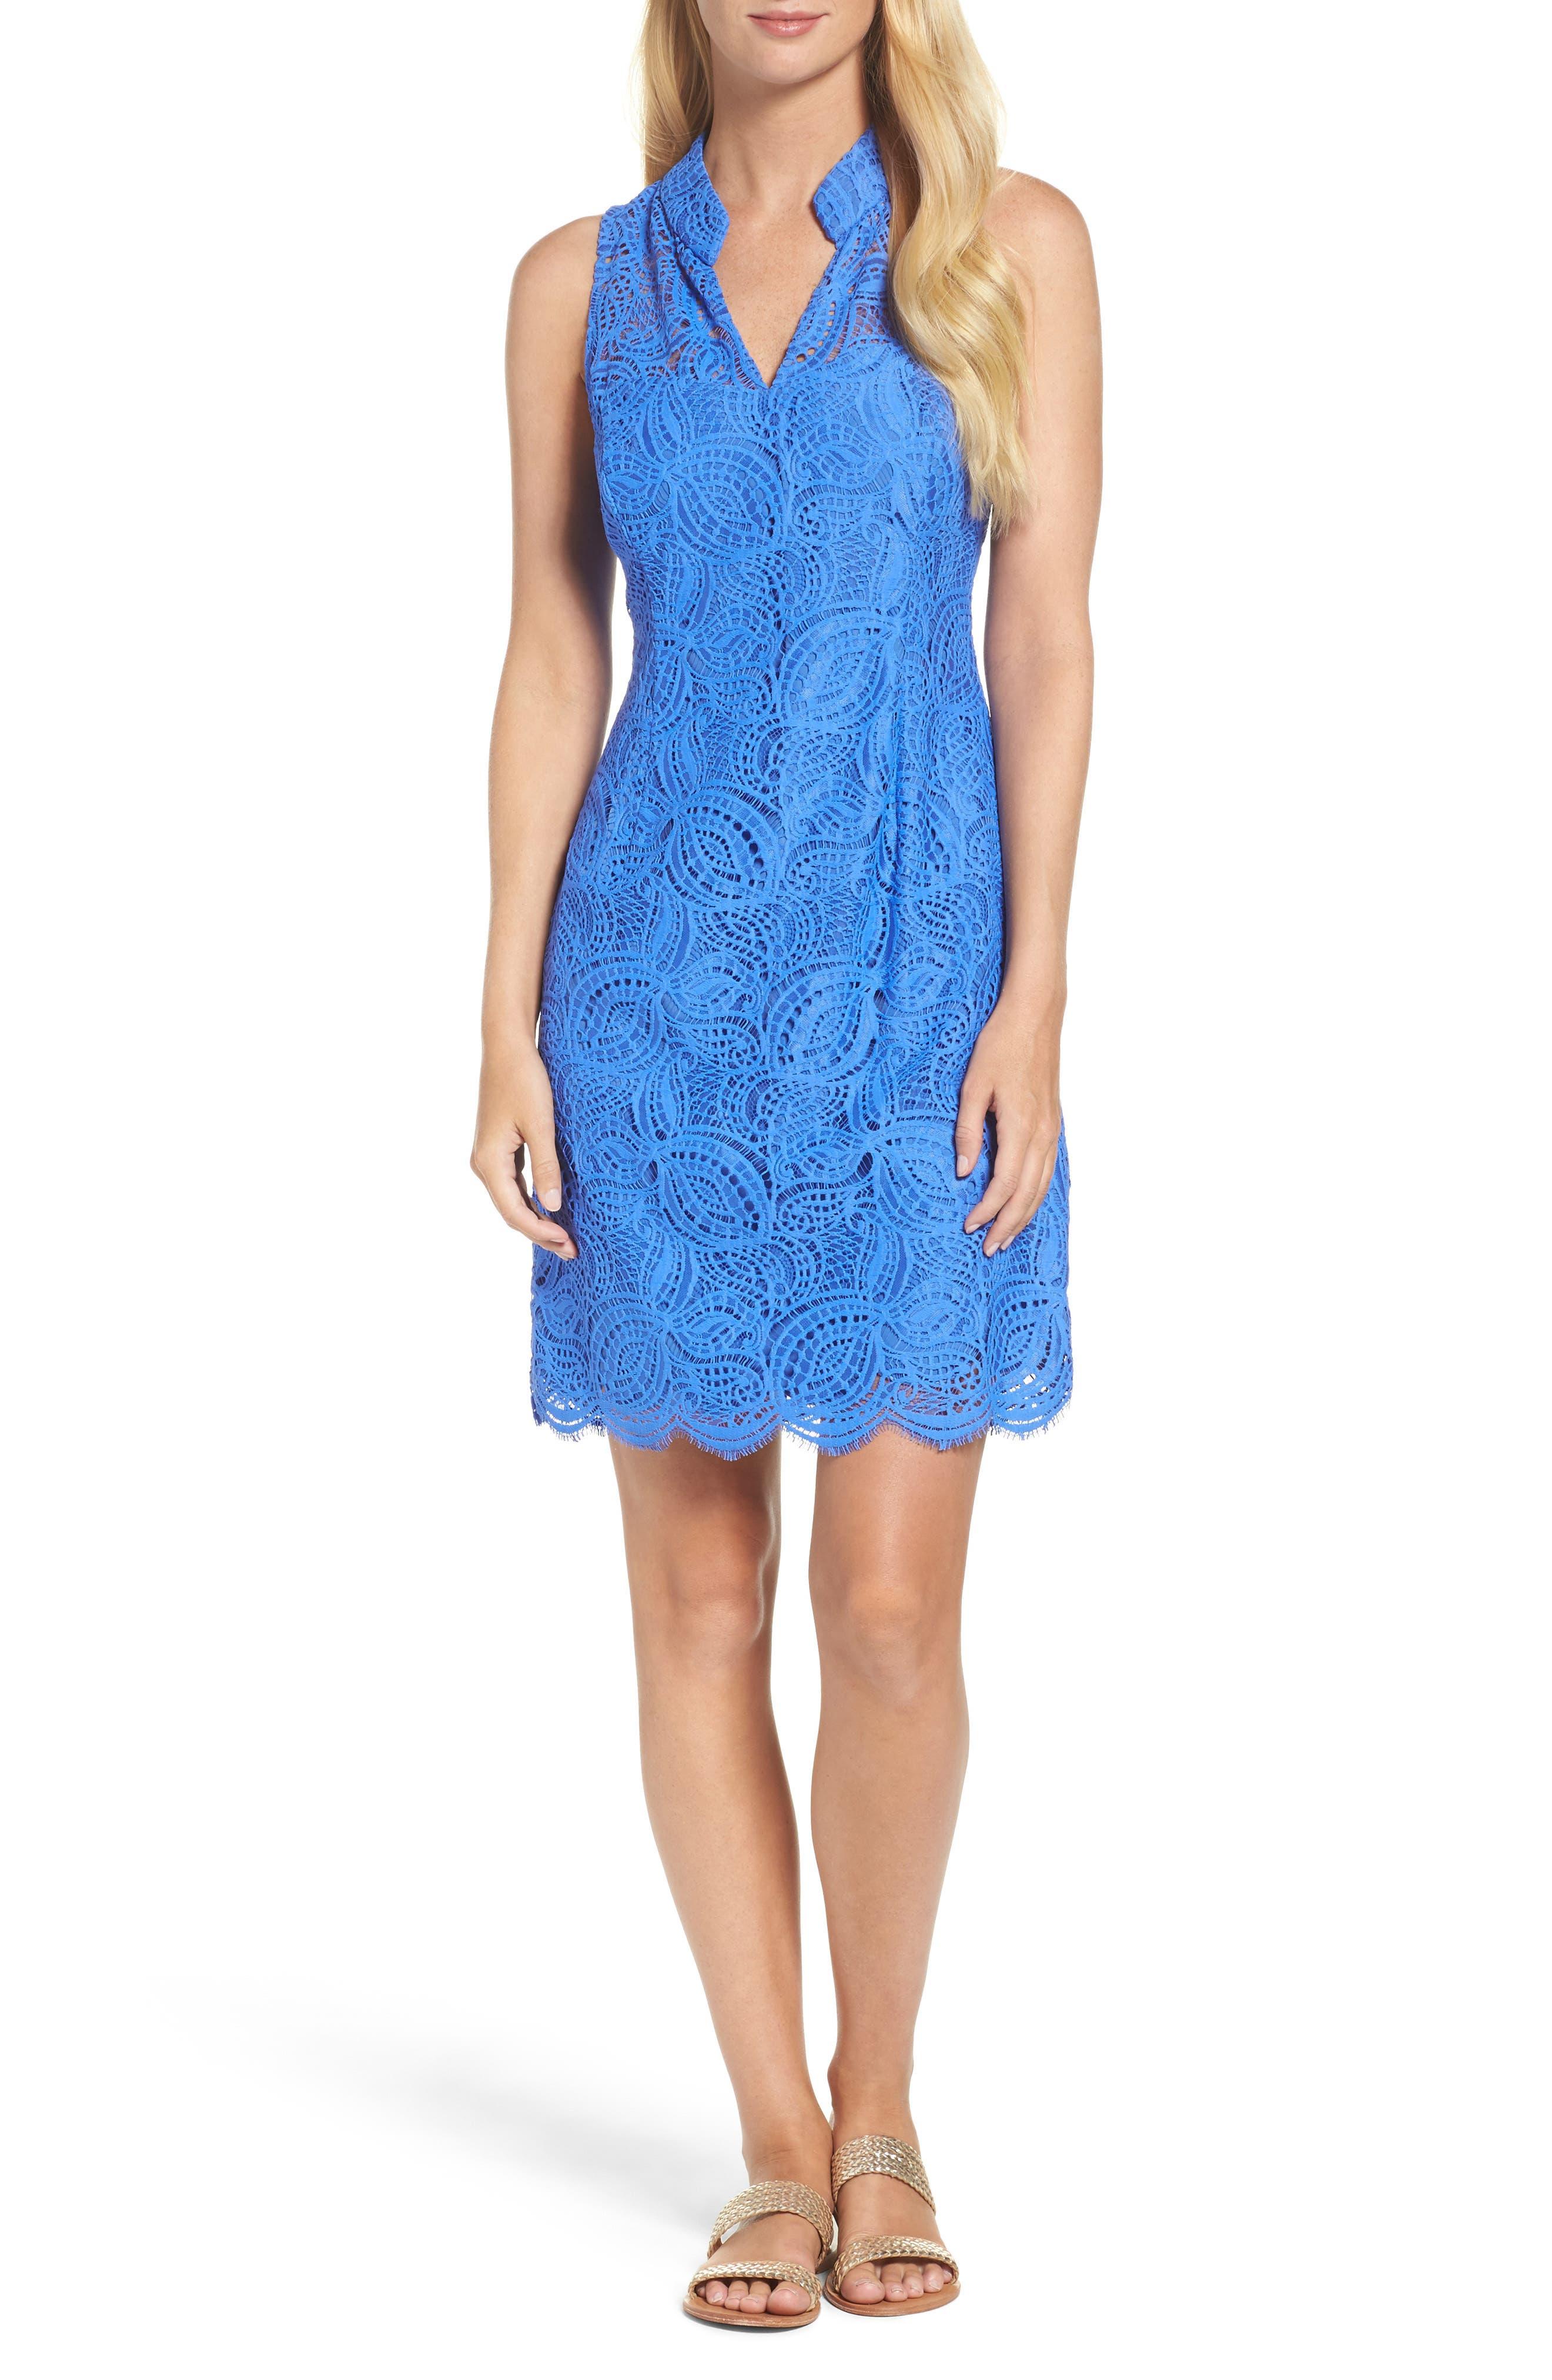 Alternate Image 1 Selected - Lilly Pulitzer® Alexa Lace Sheath Dress